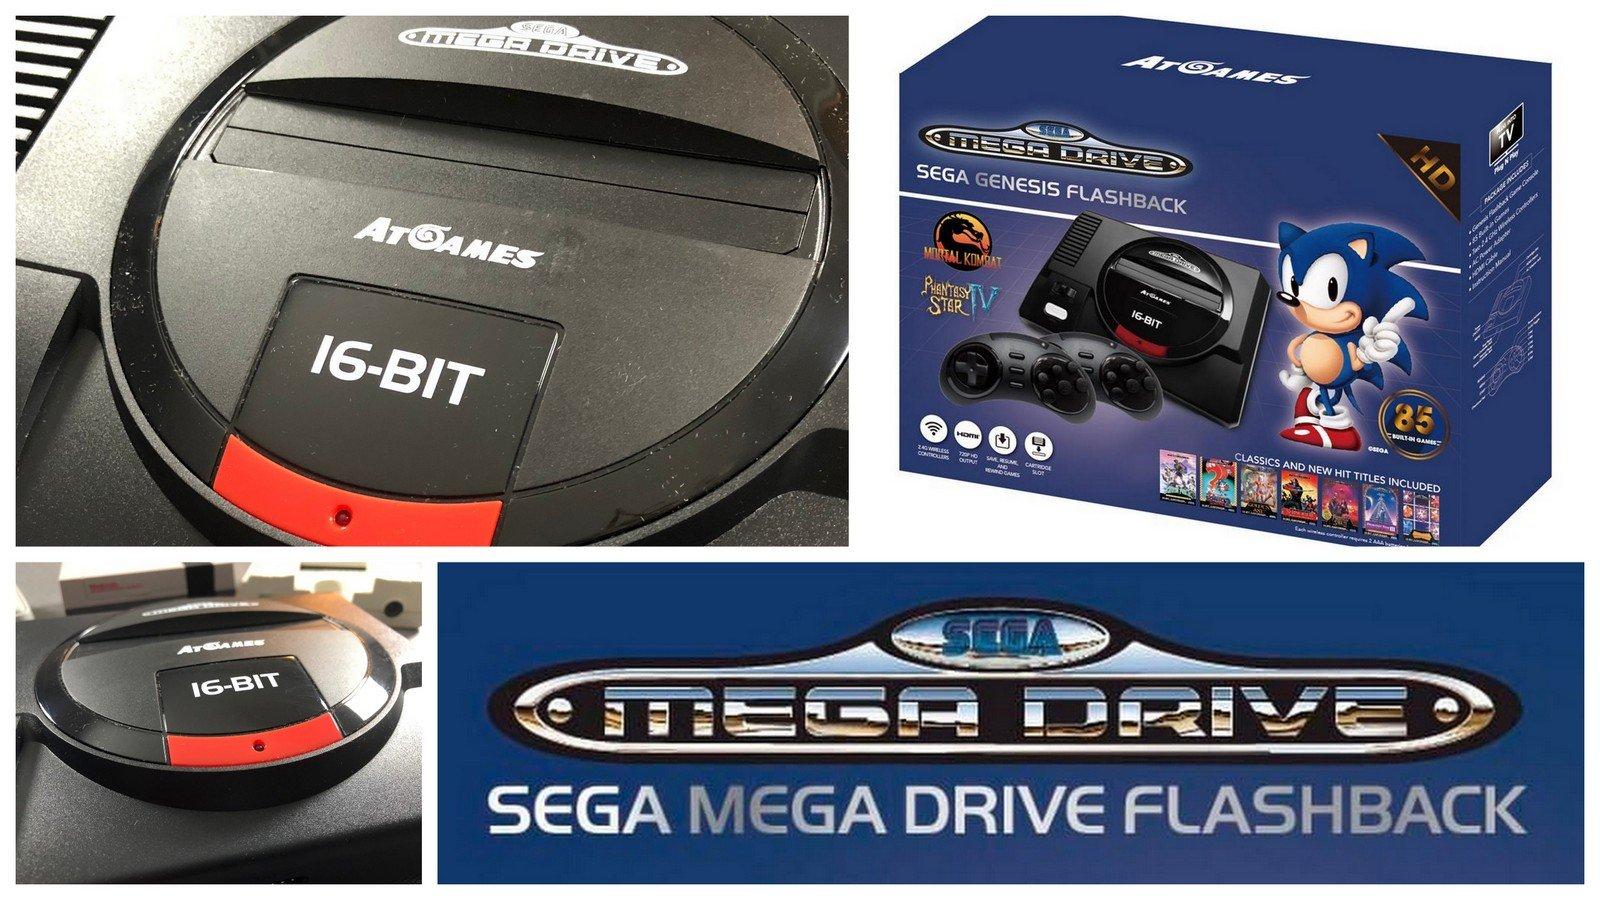 La Sega Mega Drive Mini HD au banc d'essai !